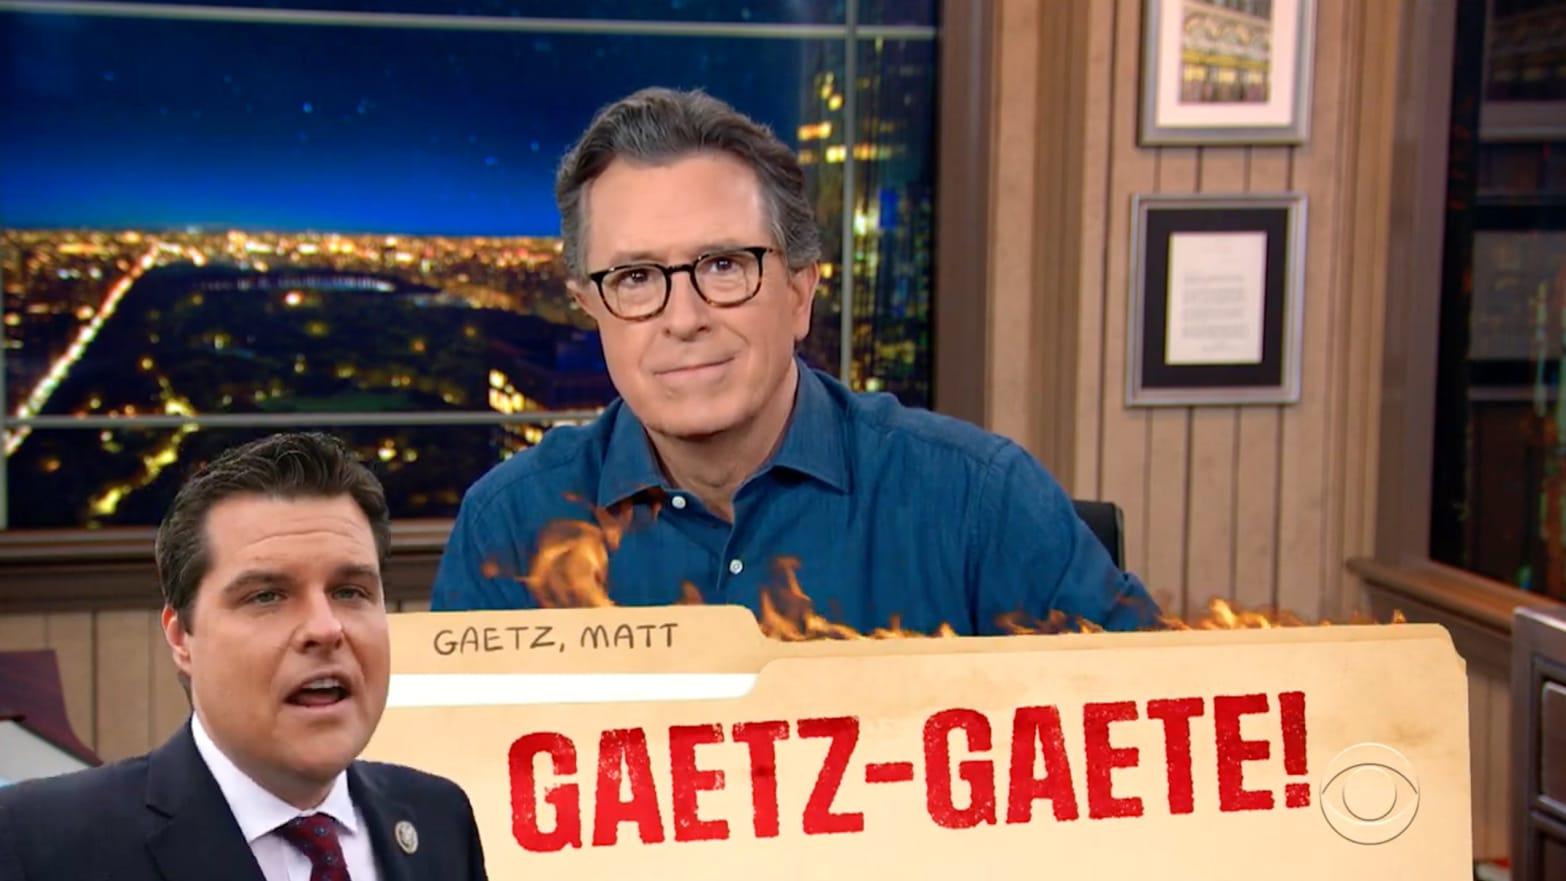 Stephen Colbert Absolutely Destroys Matt Gaetz's Trump Pardon Fail - The Daily Beast